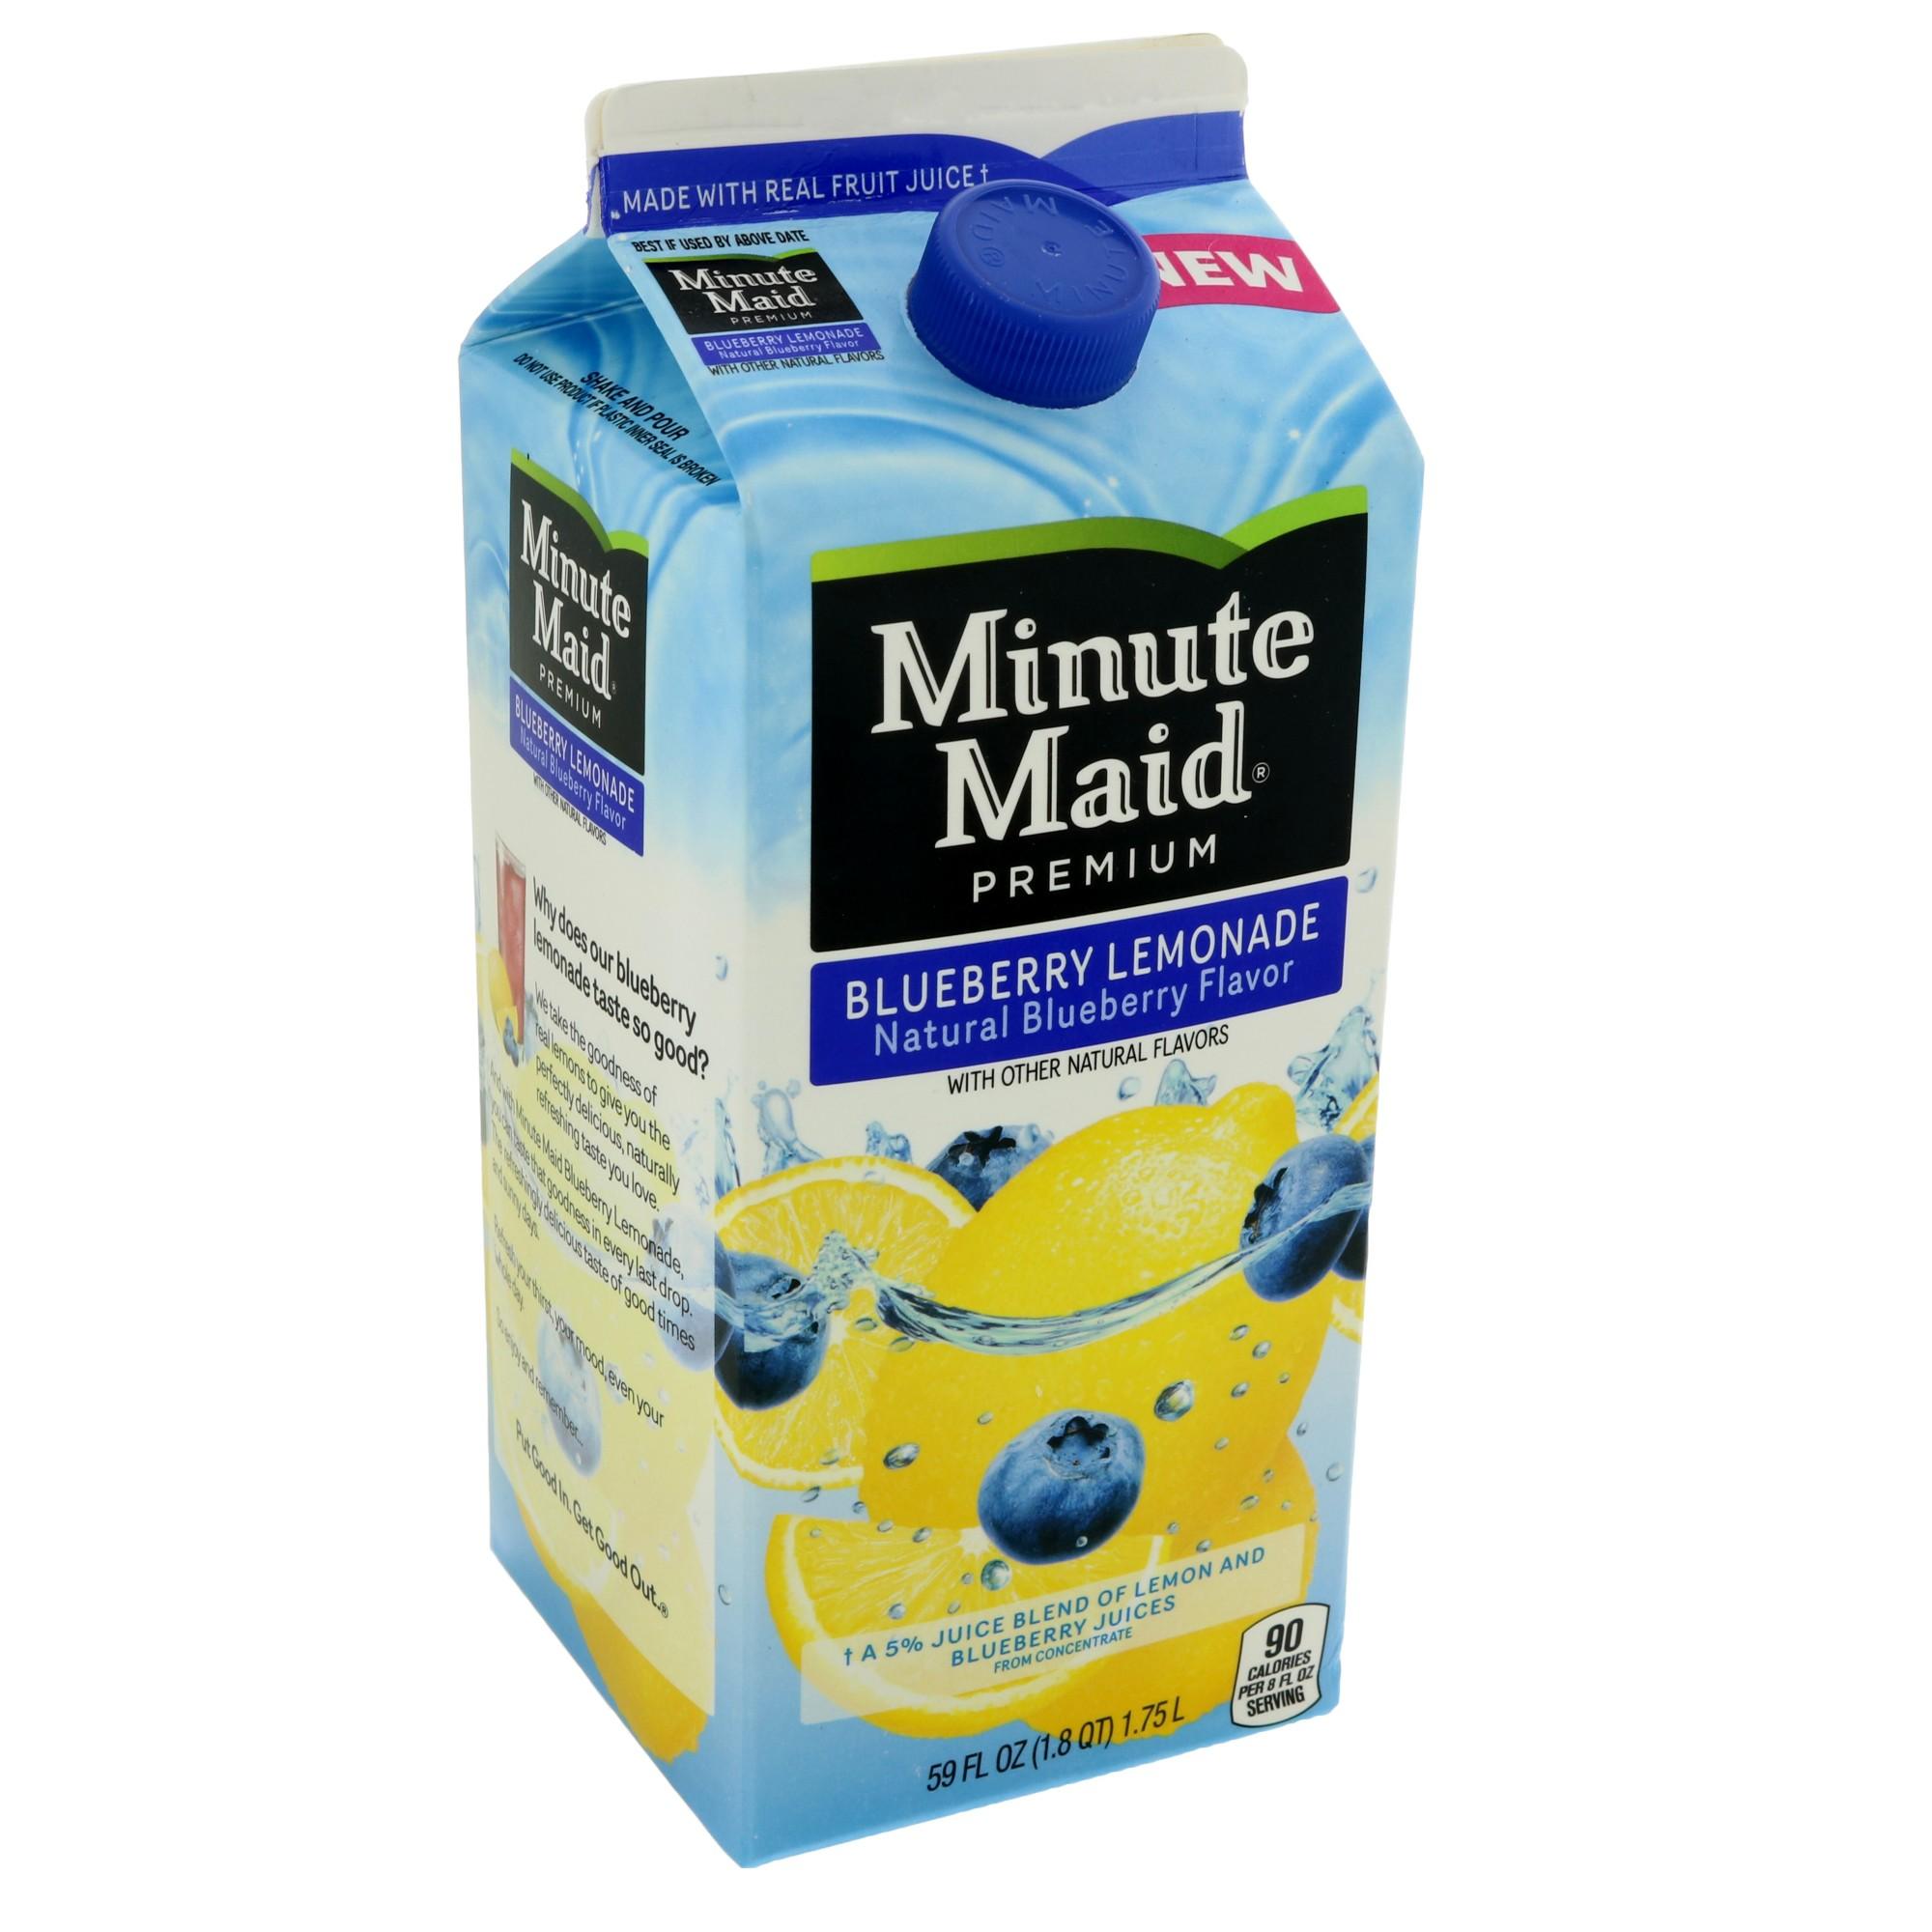 Blueberry Lemonade Drink Mix